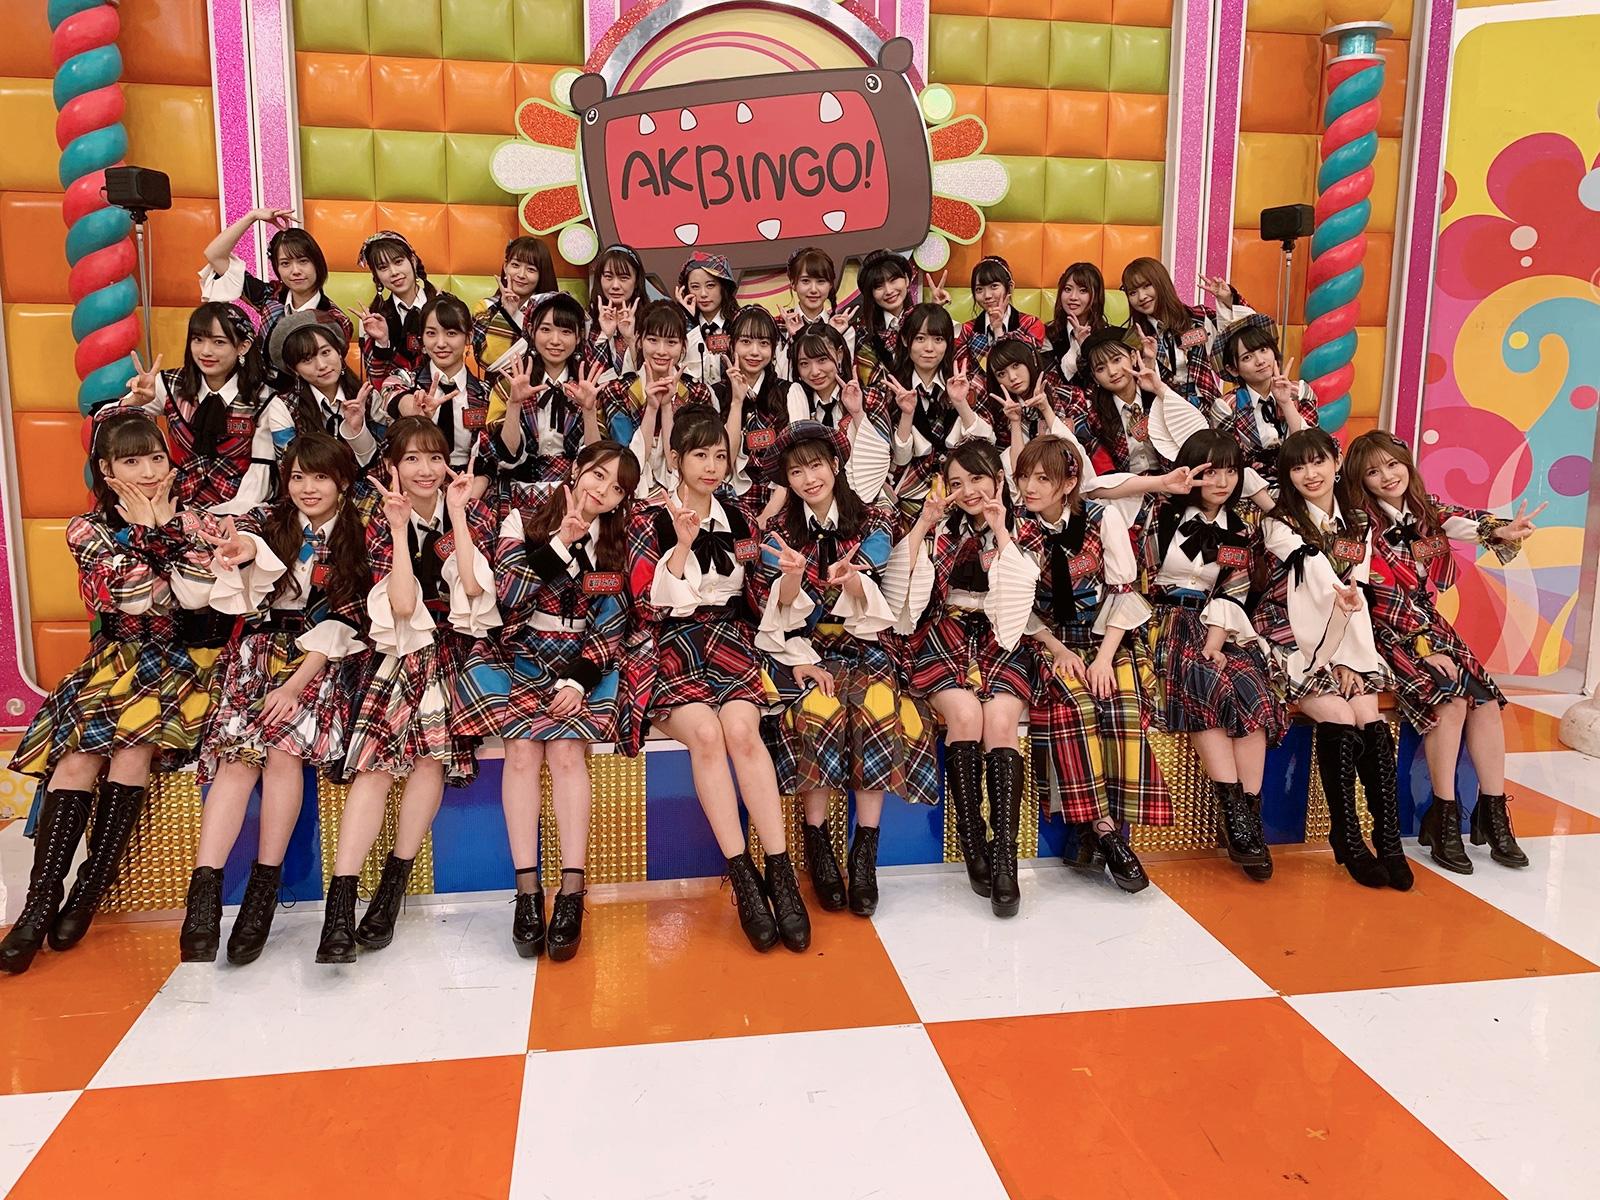 【AKB48チーム8東京都代表/チームA】小栗有以応援スレ☆35【ゆいゆい】 YouTube動画>11本 ->画像>231枚